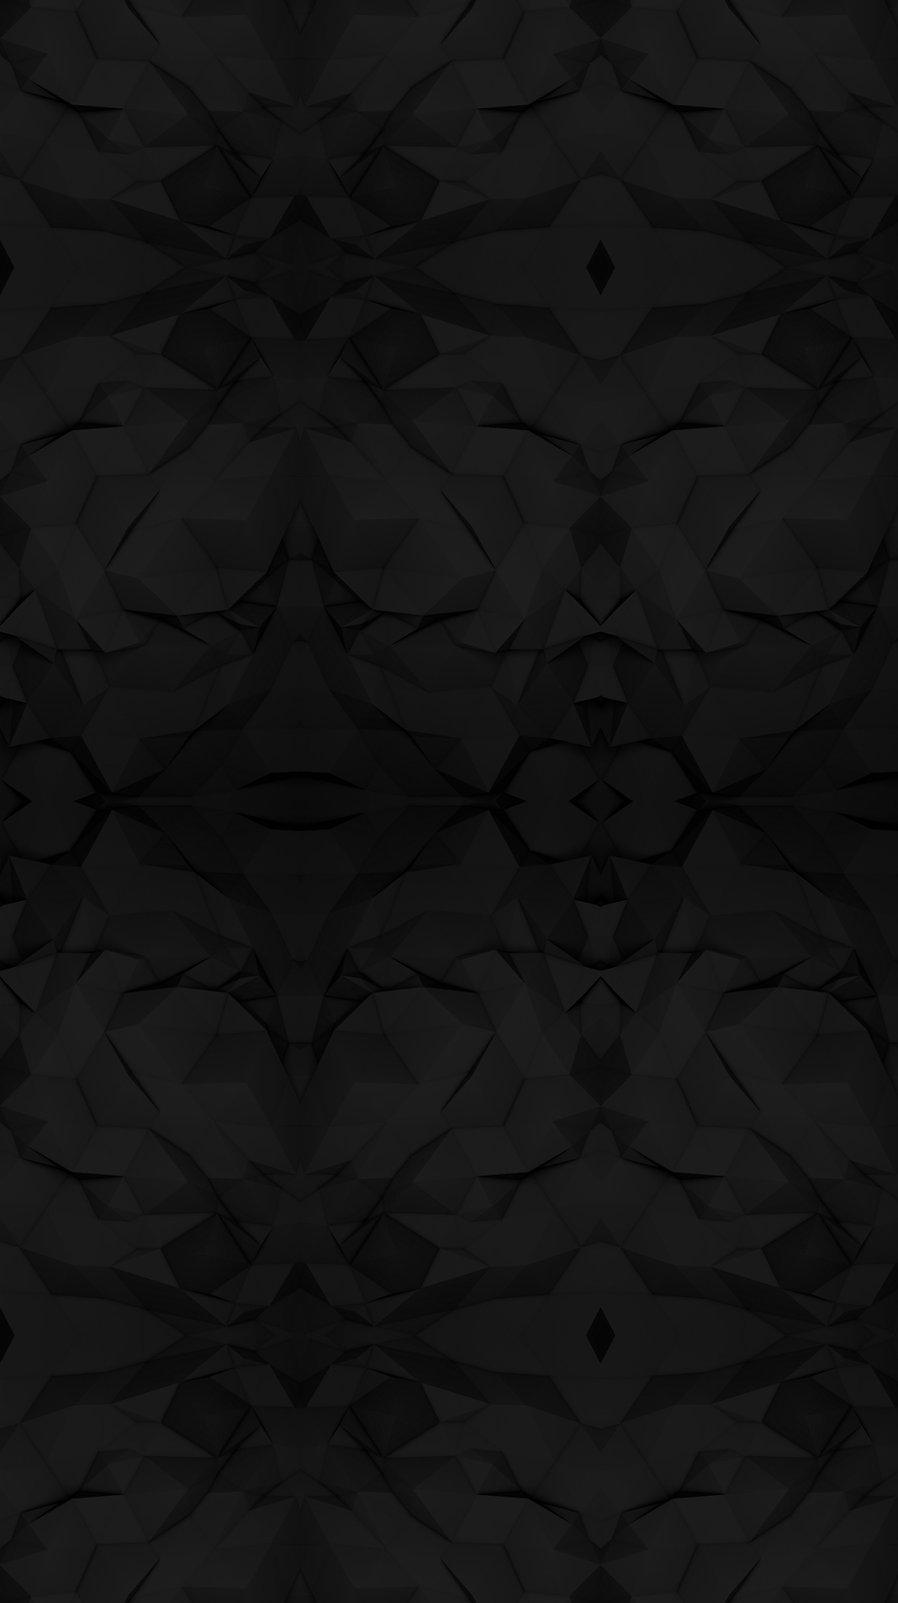 Black%20geo%203_edited.jpg